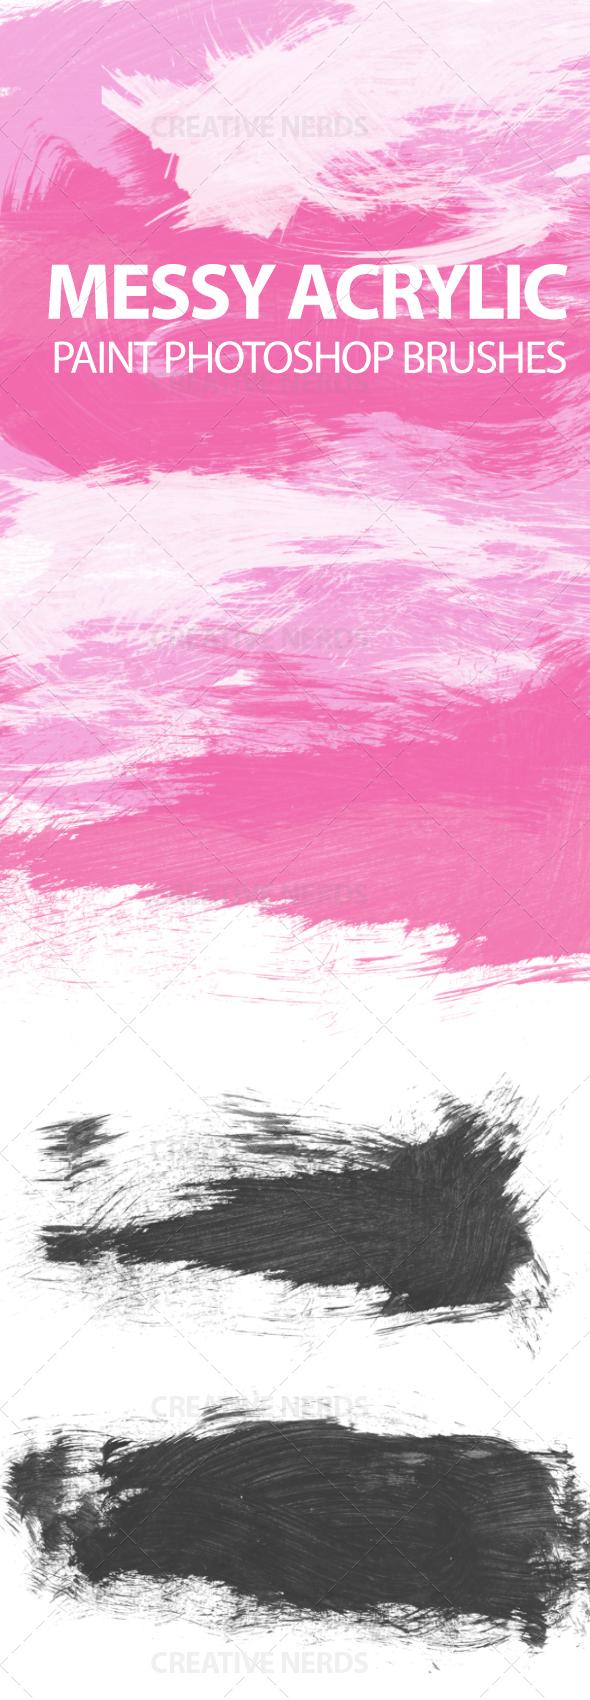 watermarked messyacyrlic paint strokes Premium members: 9 Acrylic paint strokes Photoshop brushes